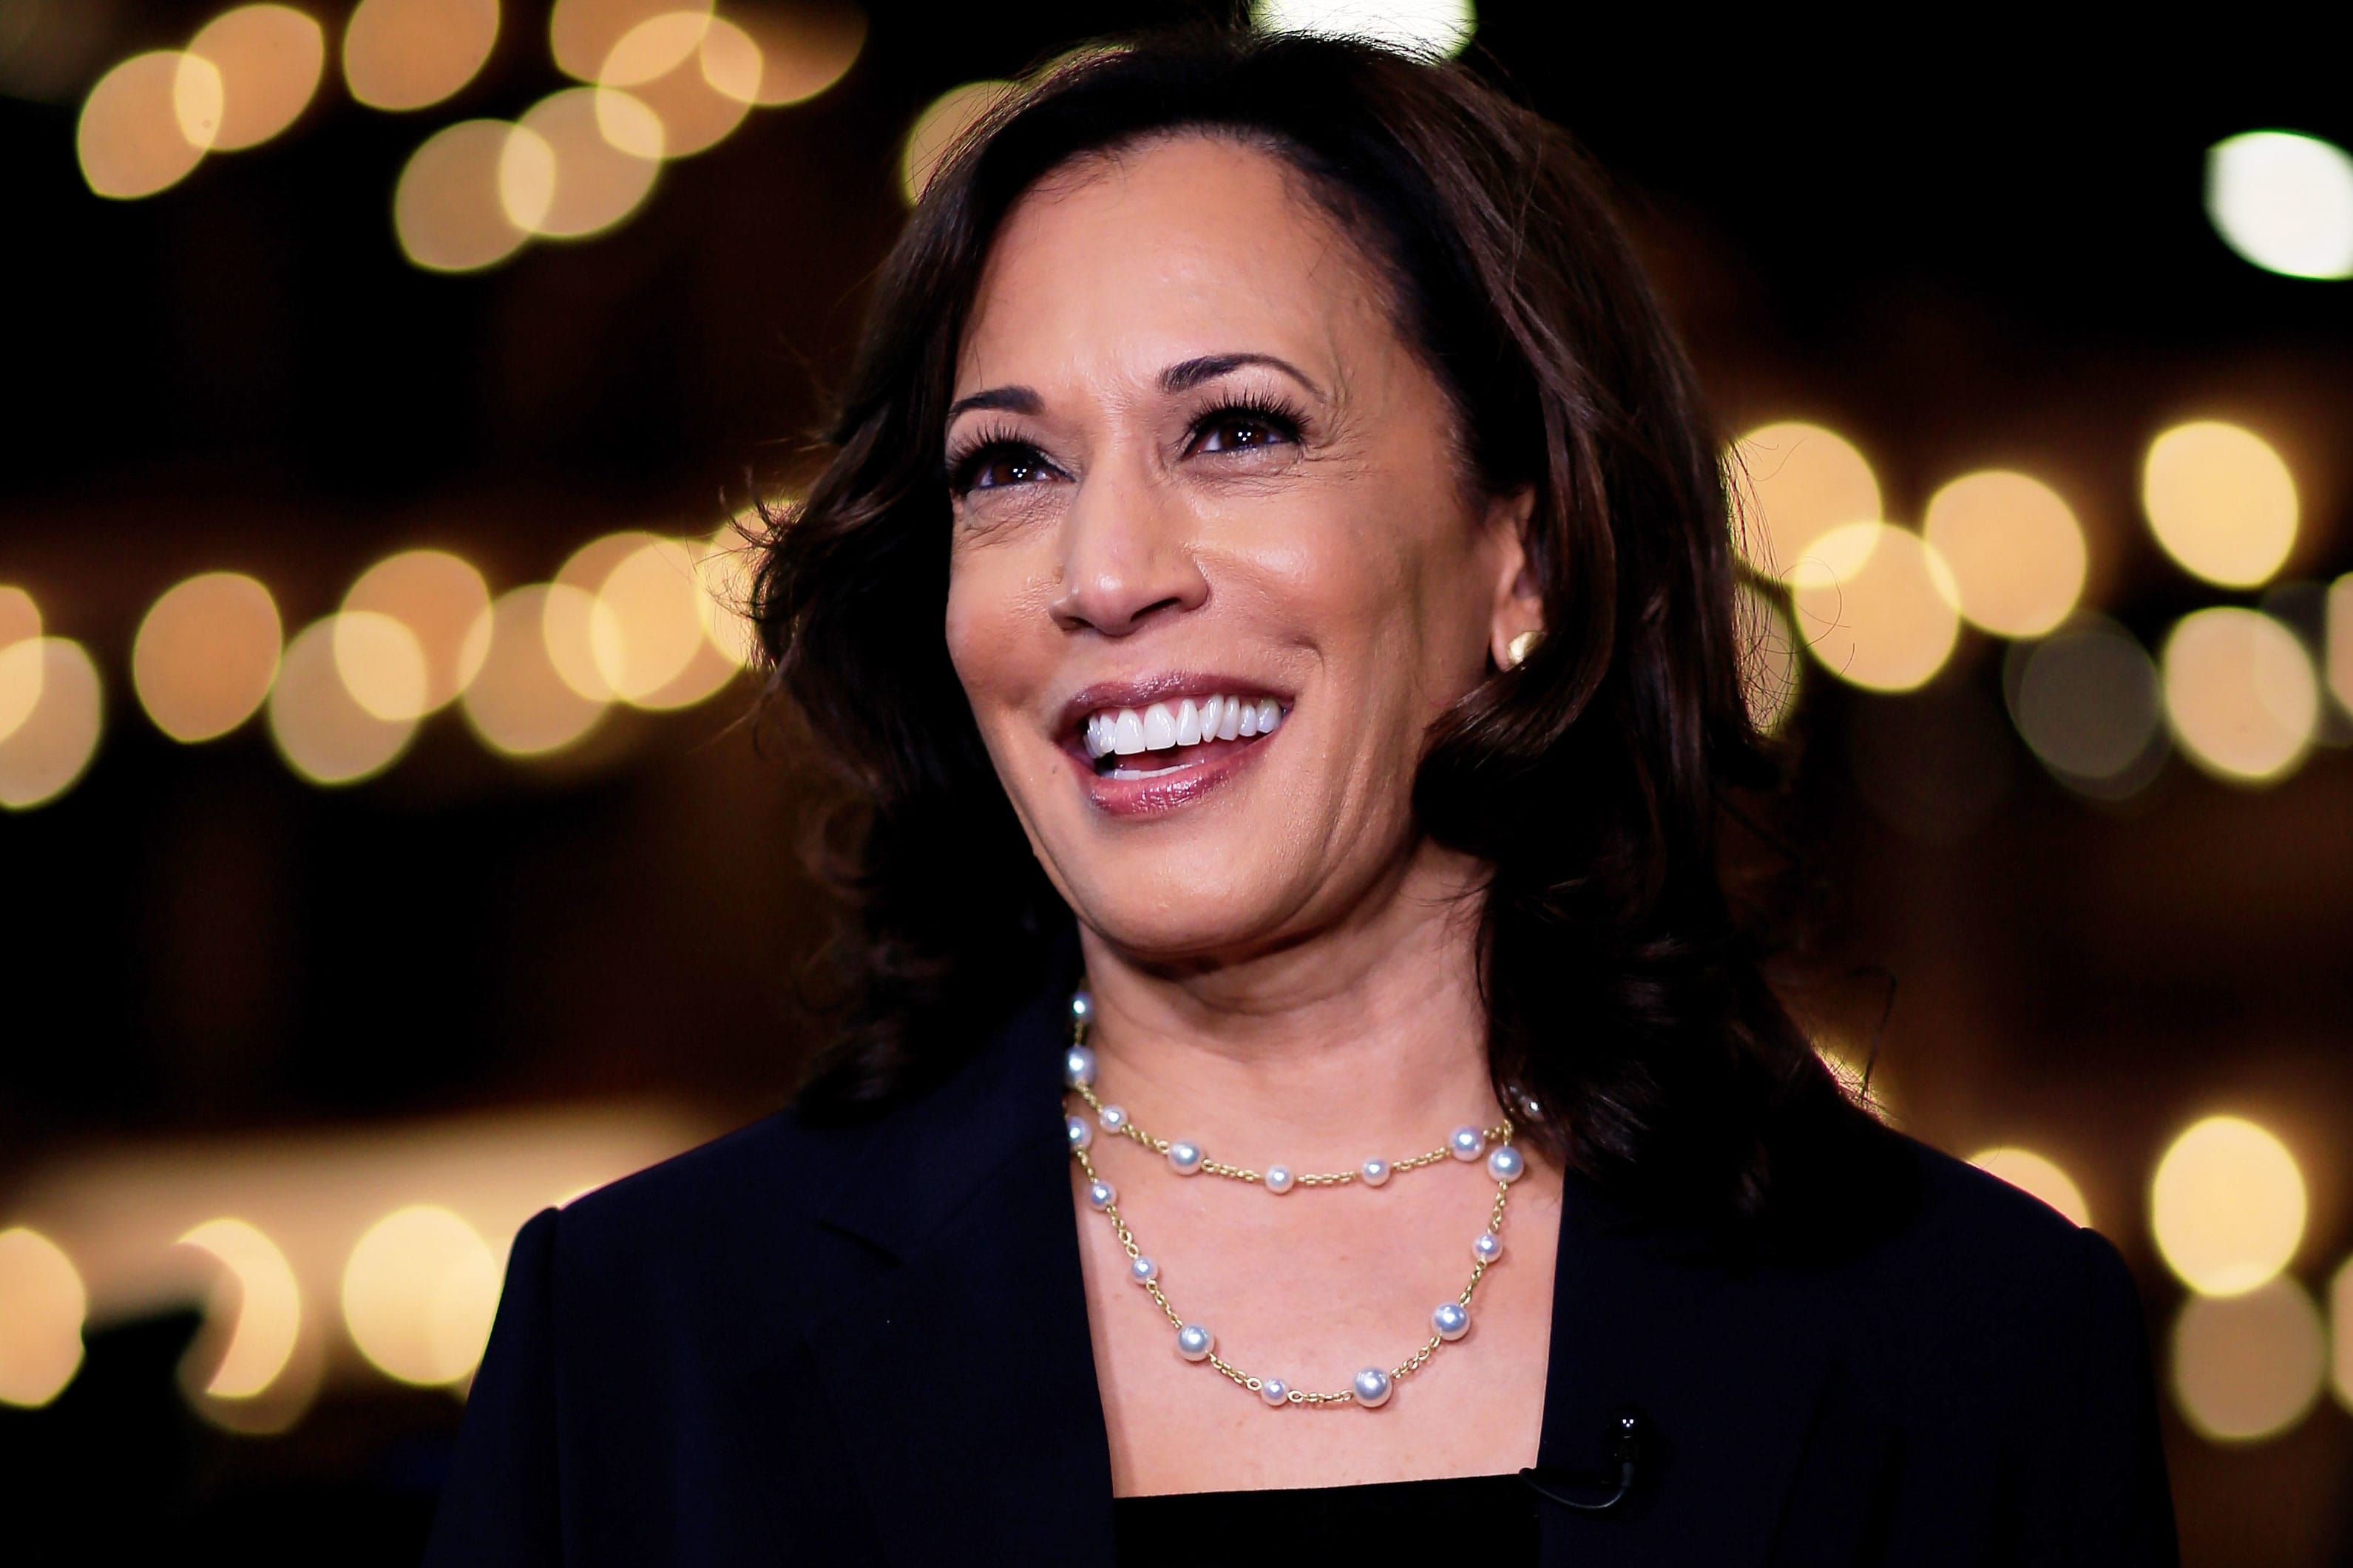 Kamala Harris bundlers see wave of outreach post debate performance as Joe Biden's momentum fades